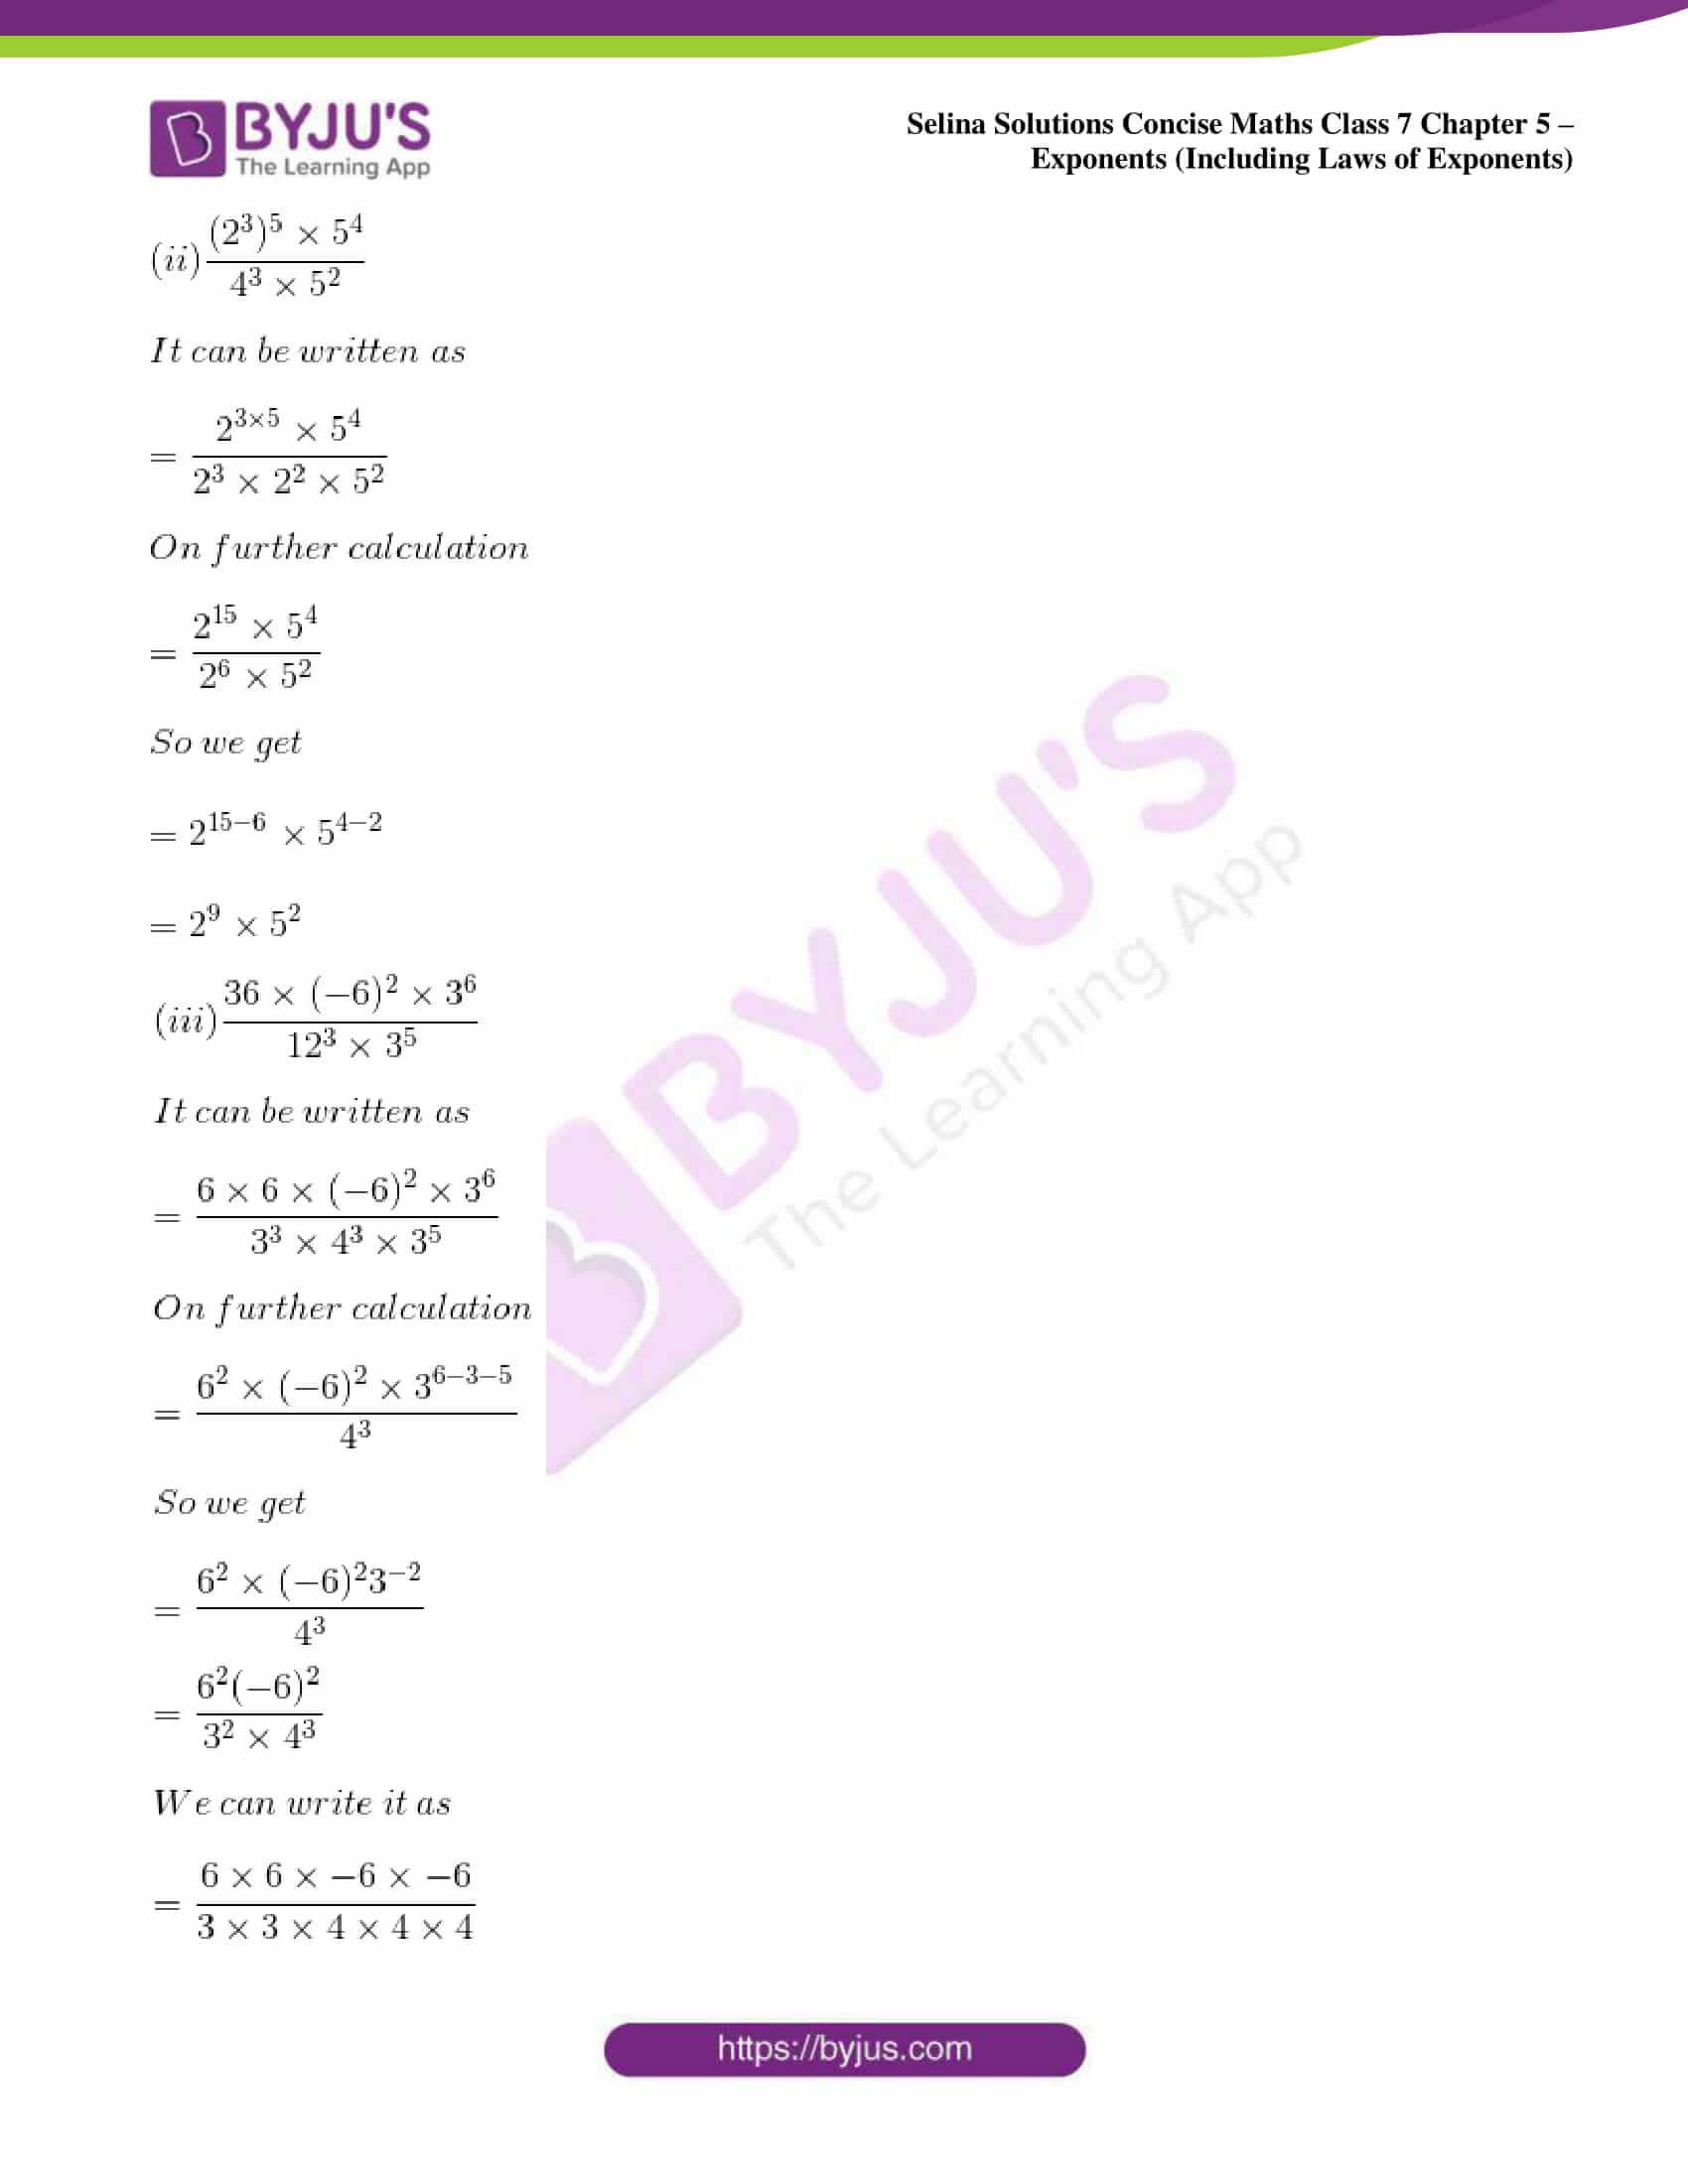 selina sol concise maths class 7 ch5 ex 5b 10